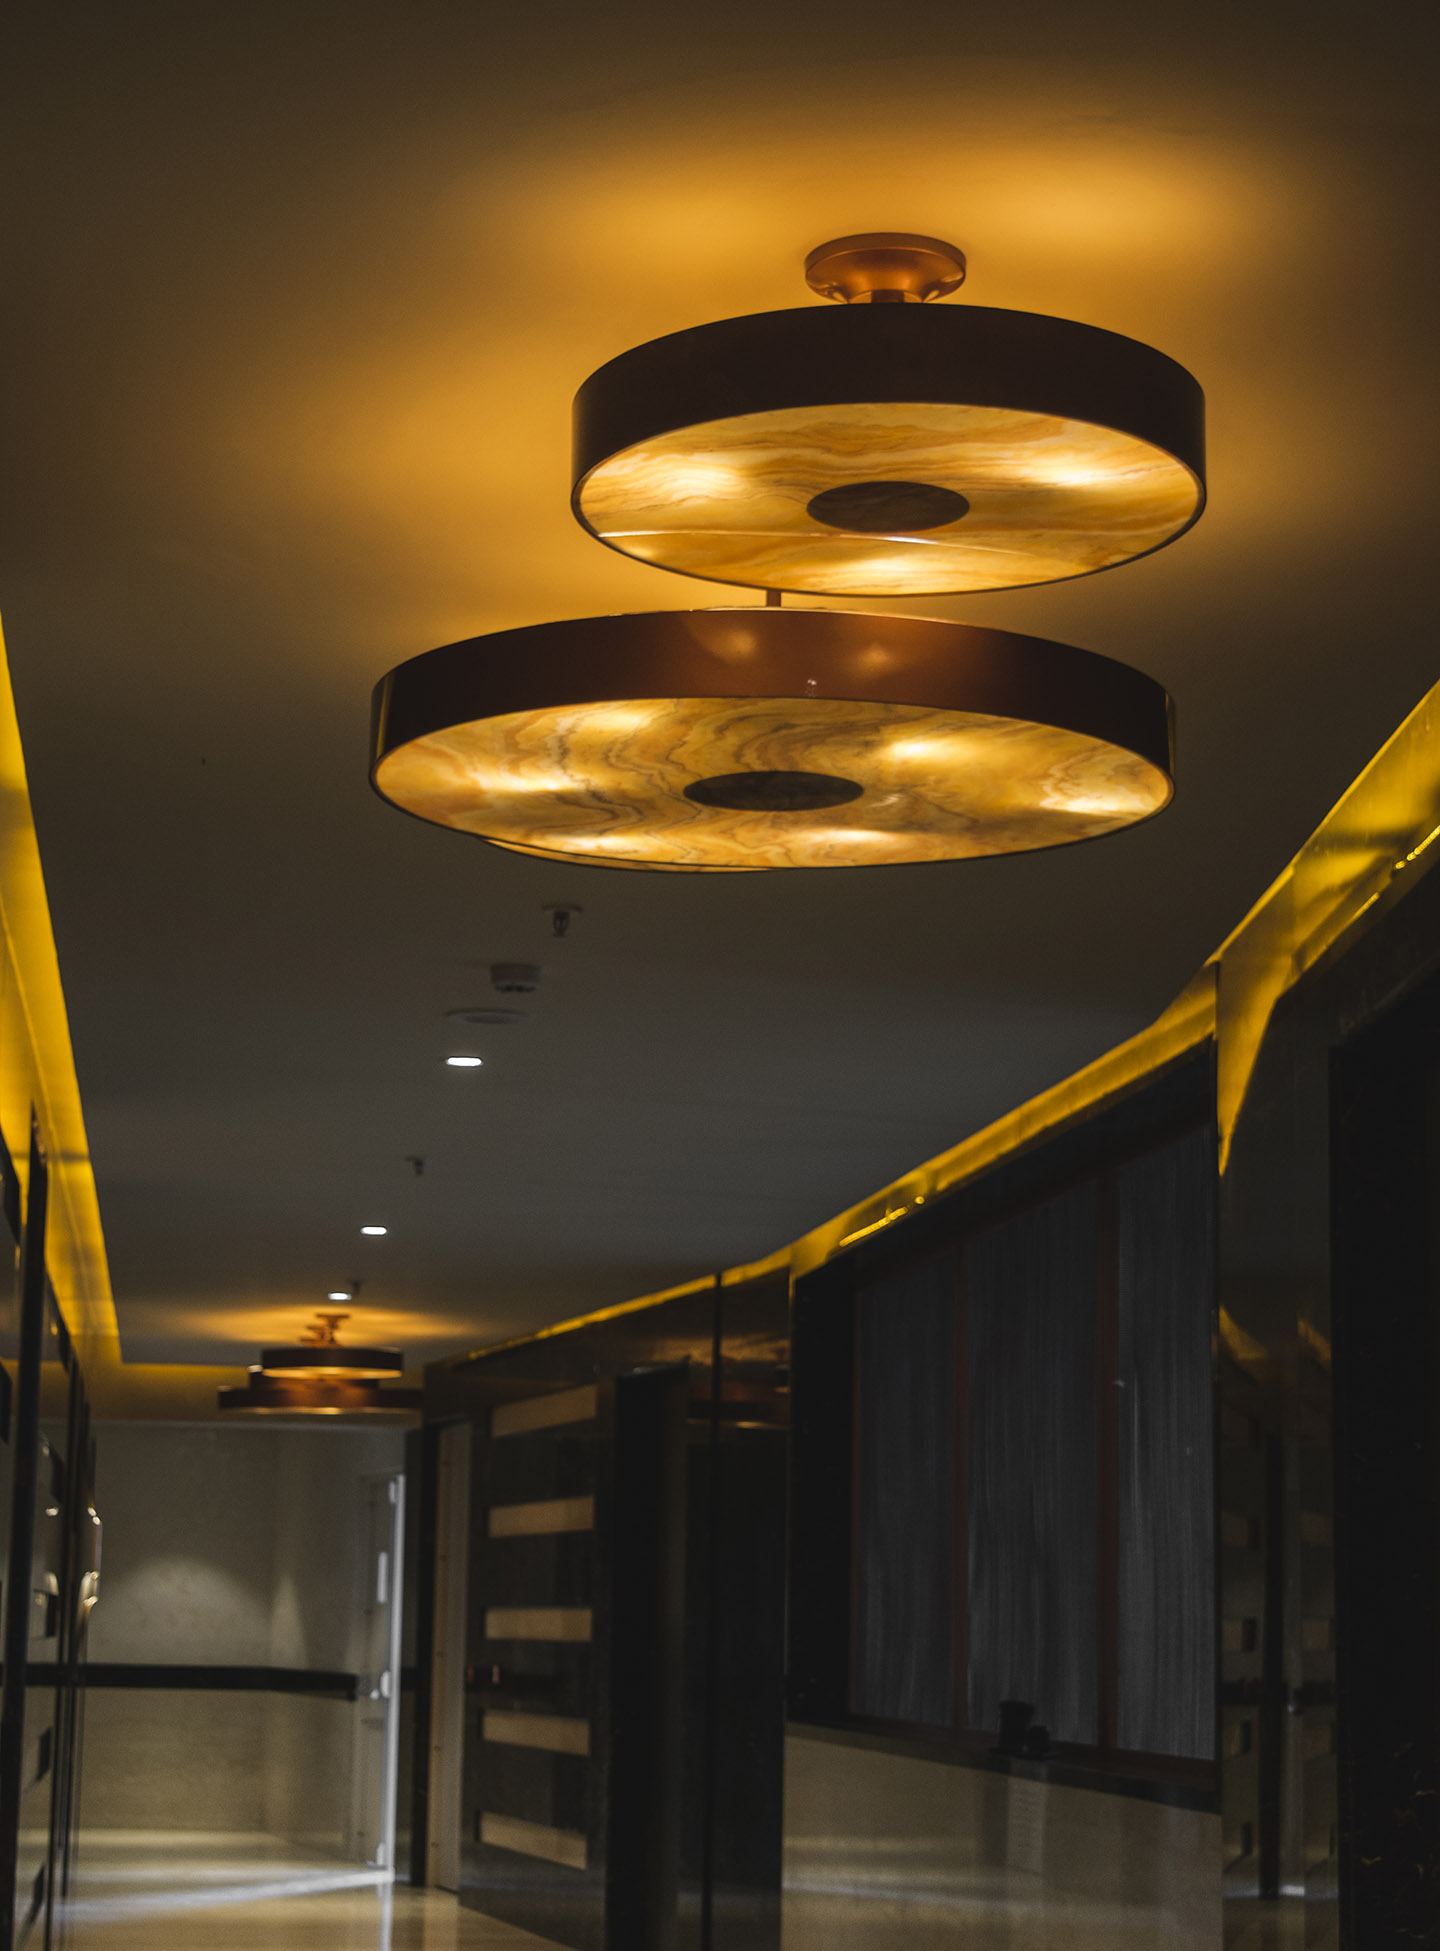 Ceiling Copper Lights